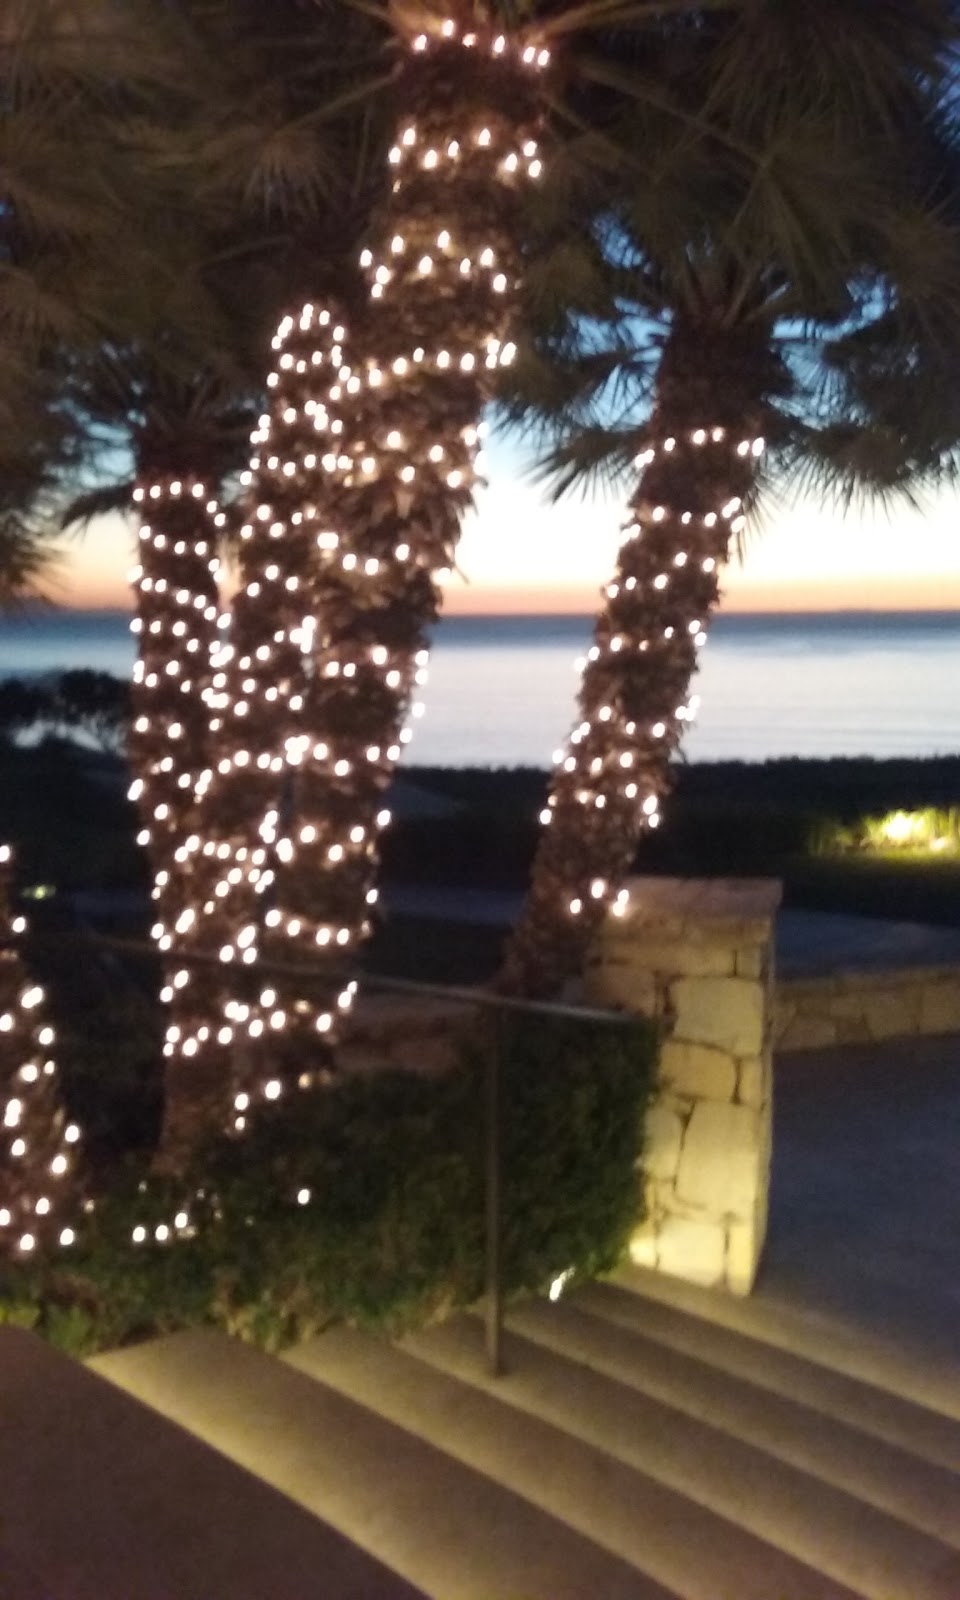 Golfers Lounge - restaurant  | Photo 6 of 6 | Address: 1 Trump National Dr, Rancho Palos Verdes, CA 90275, USA | Phone: (310) 303-3260